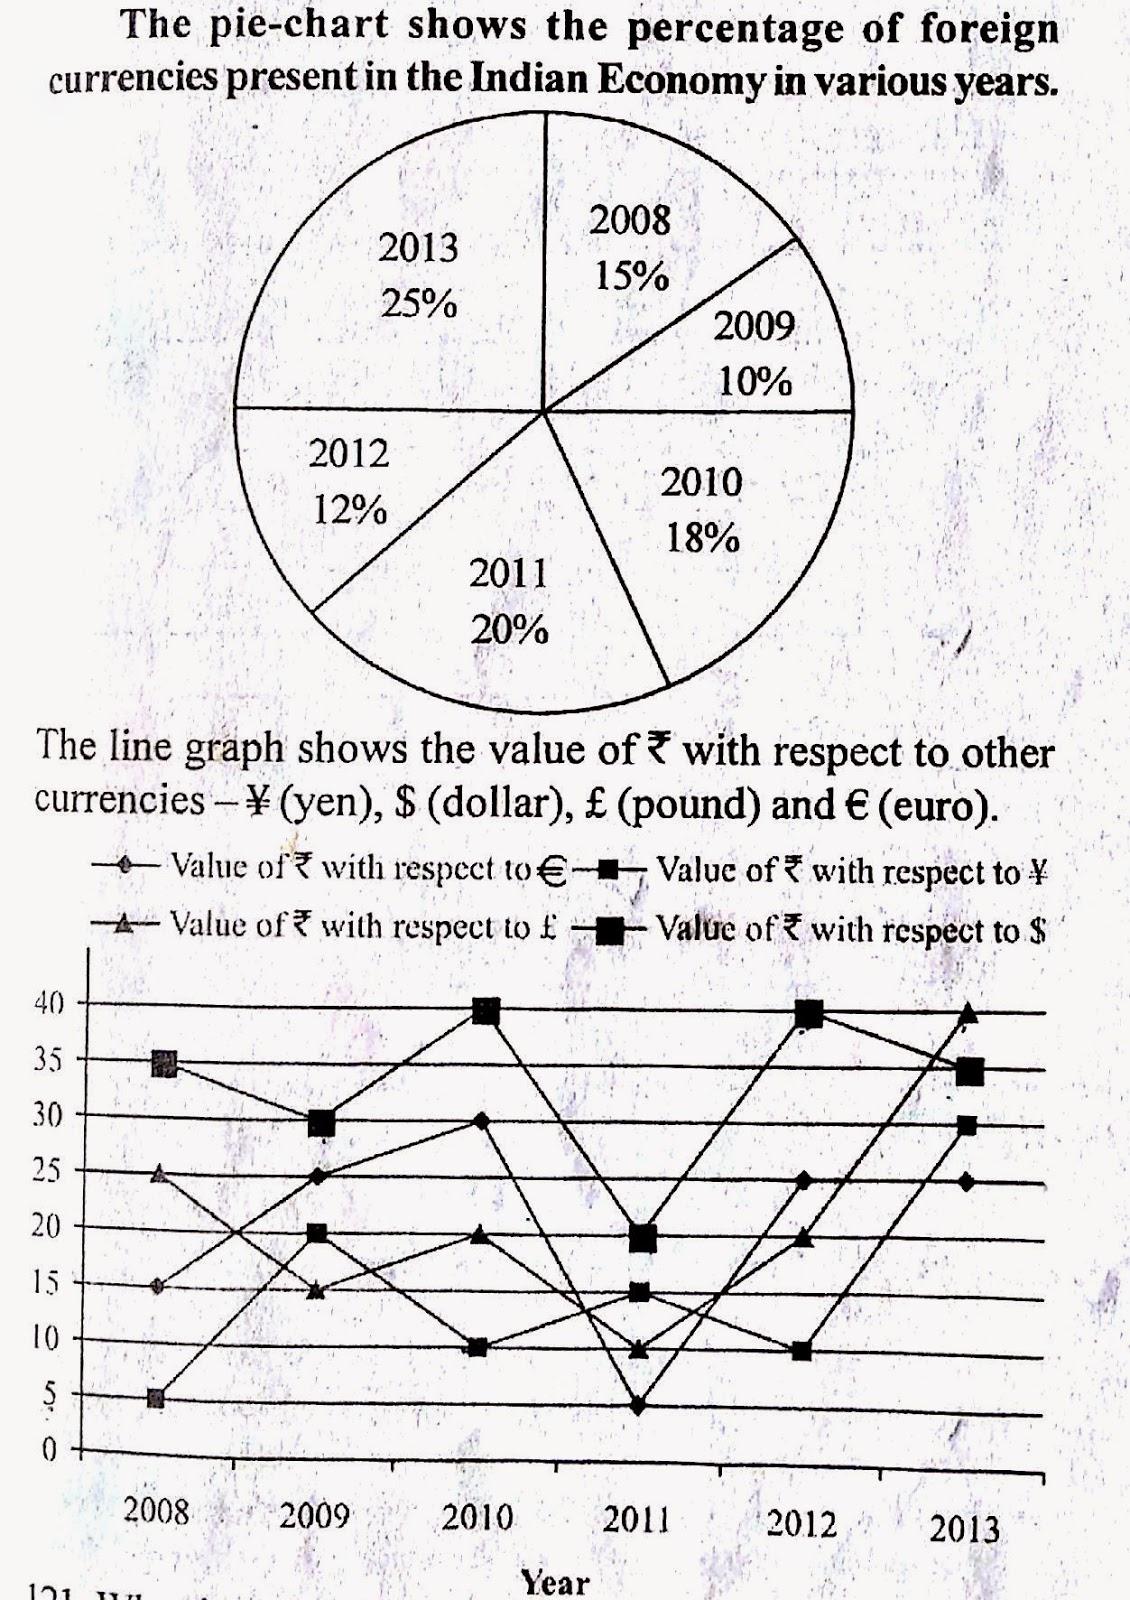 SBI PO Exam 2015- Data Interpretation Questions (With